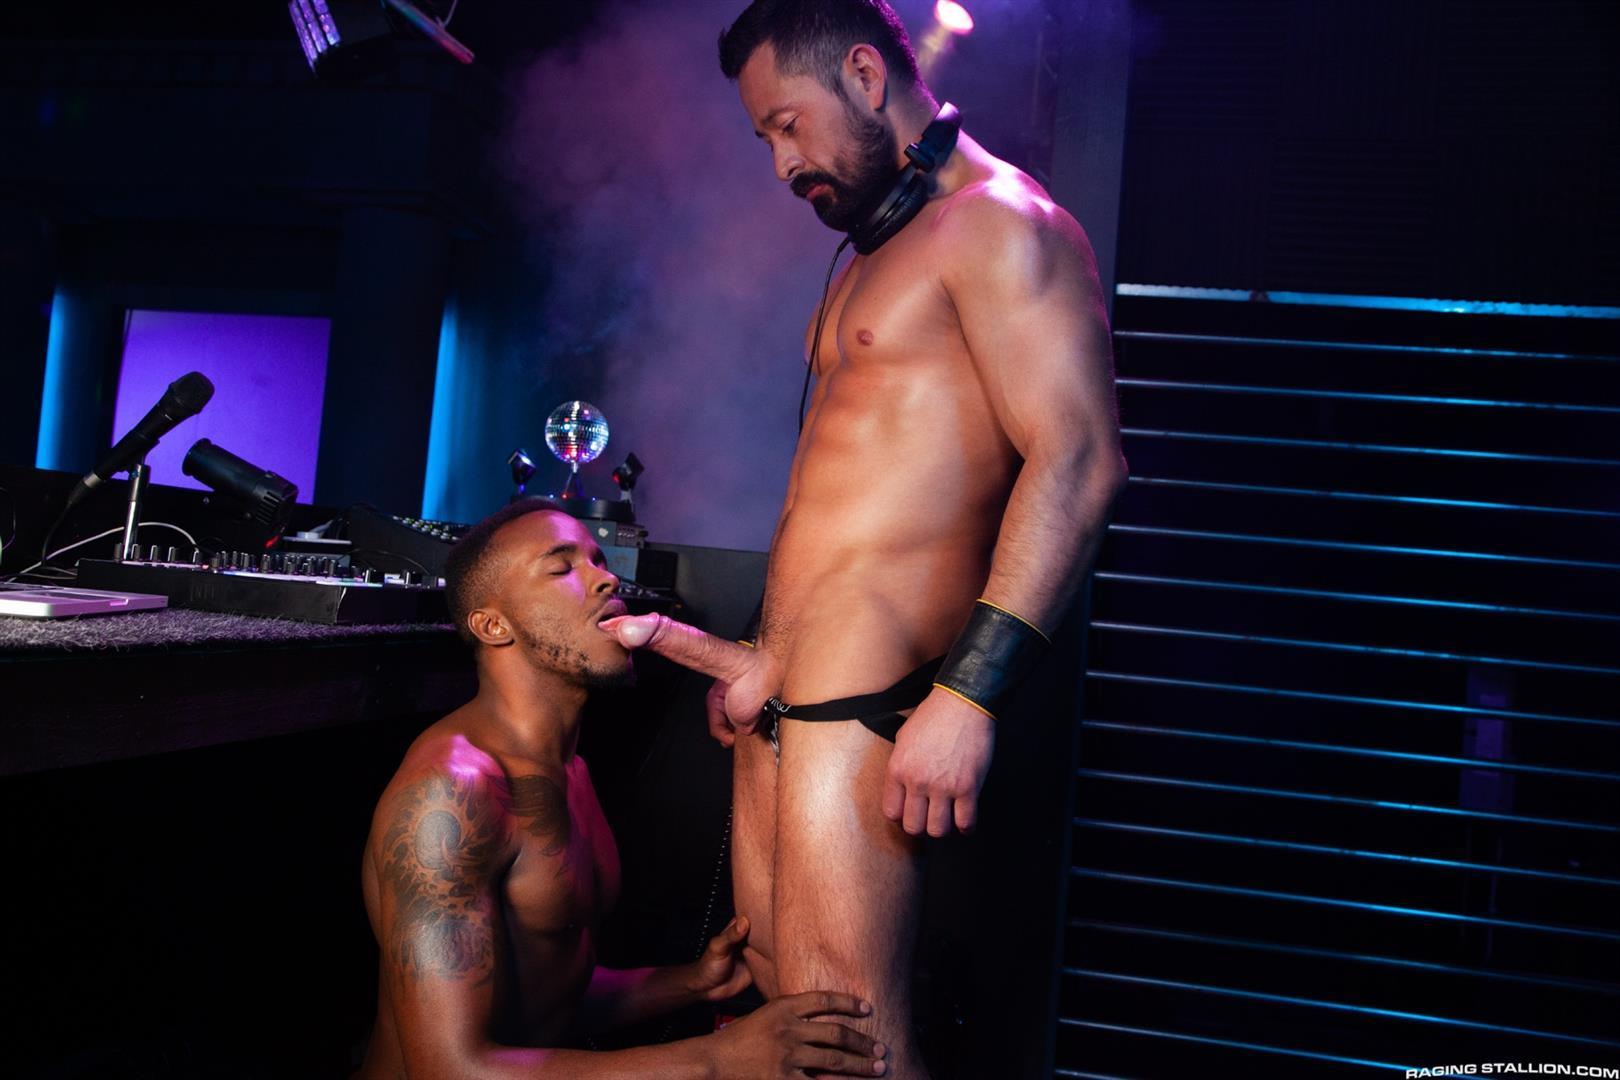 Raging-Stallion-Pheonix-Fellington-and-Cristian-Sam-Big-Black-Cocksucking-Video-08 Getting My Big Black Cock Sucked In The DJ Booth